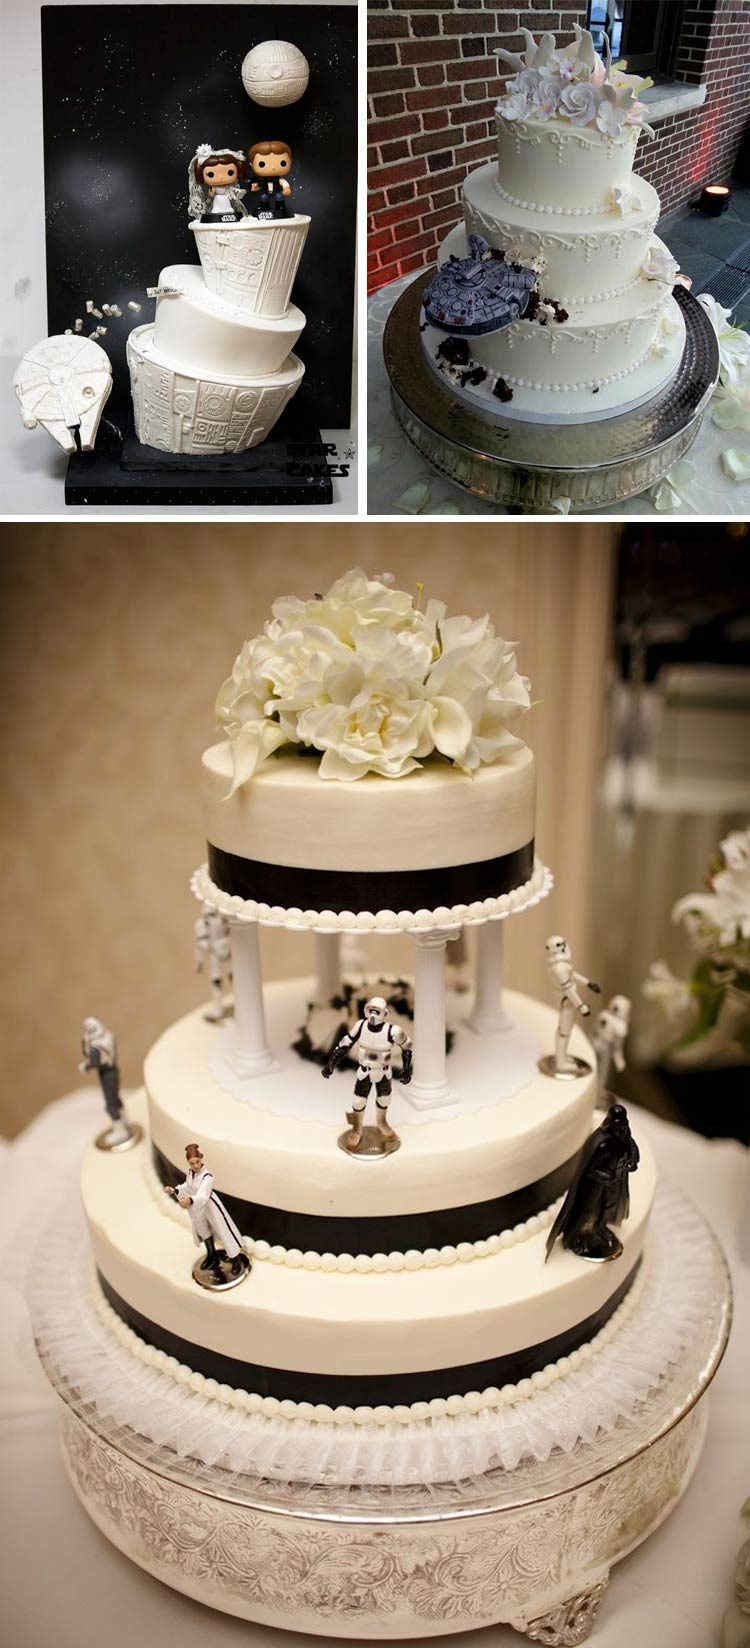 bolo-casamento-star-wars-filme